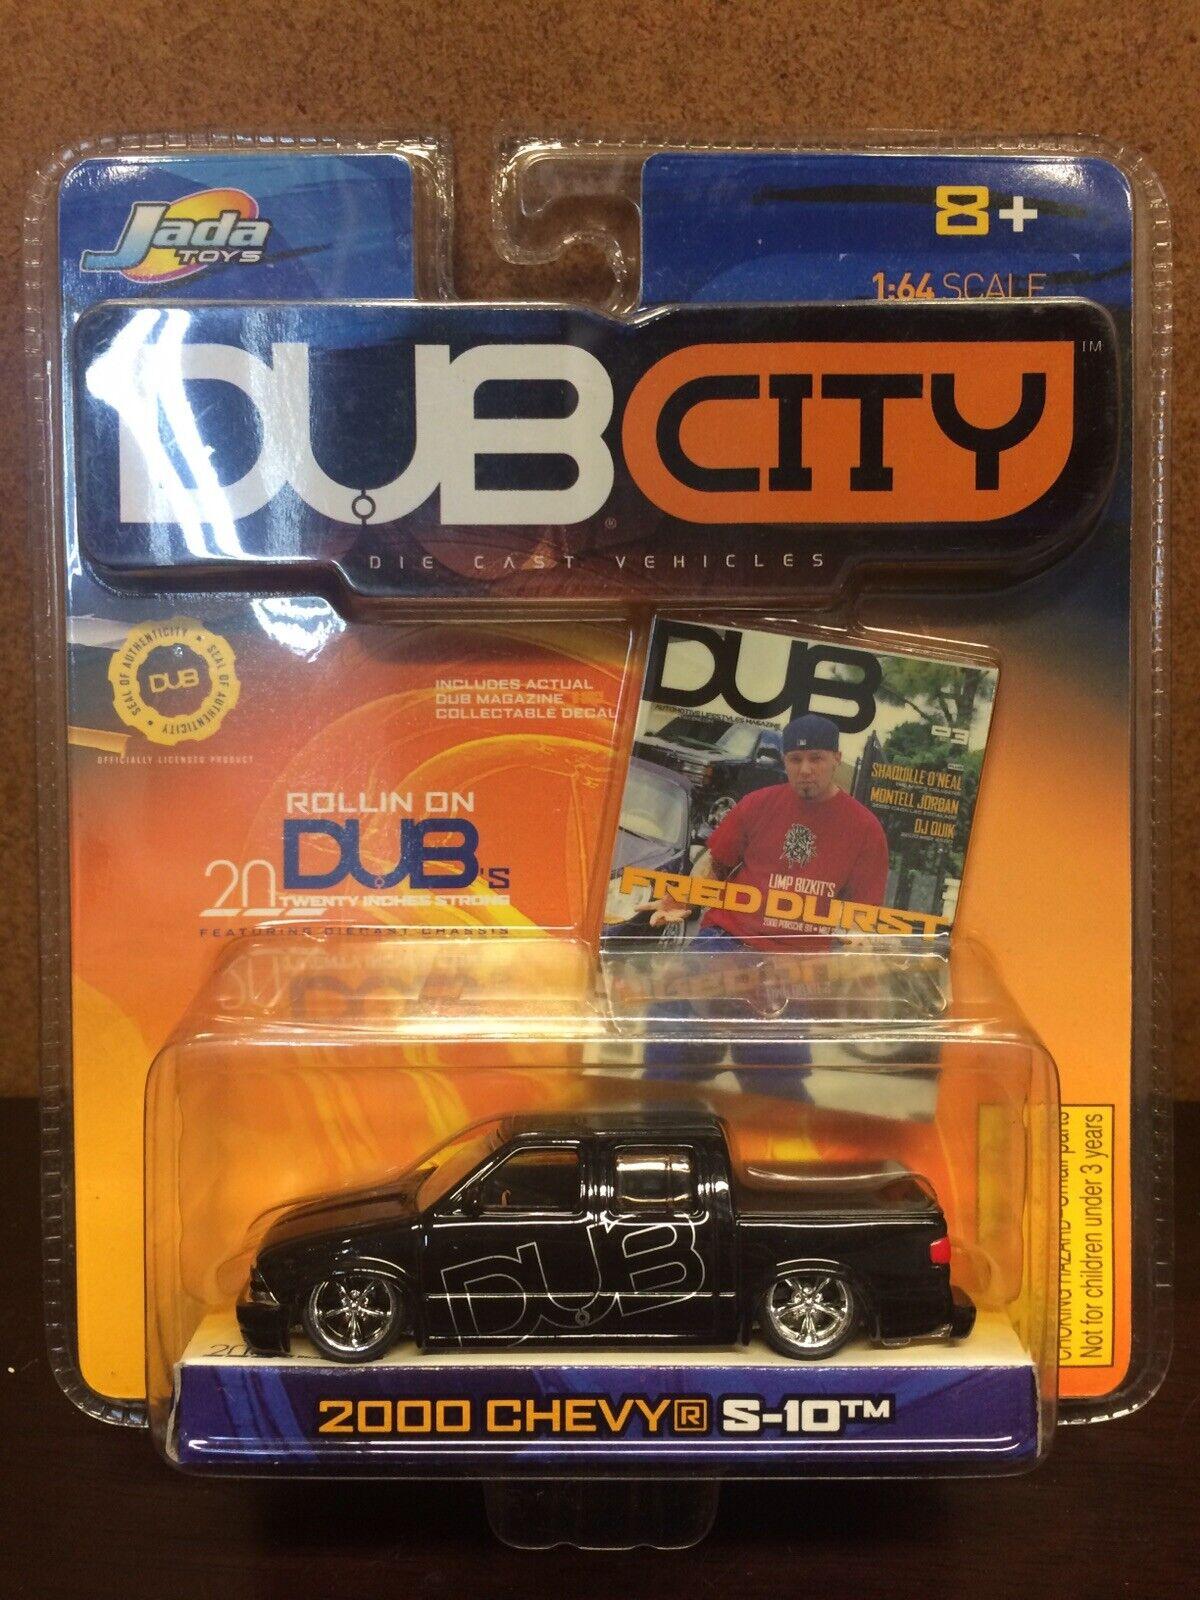 Dub Model Cars : model, Chevy, Xtreme, Chevrolet, Online